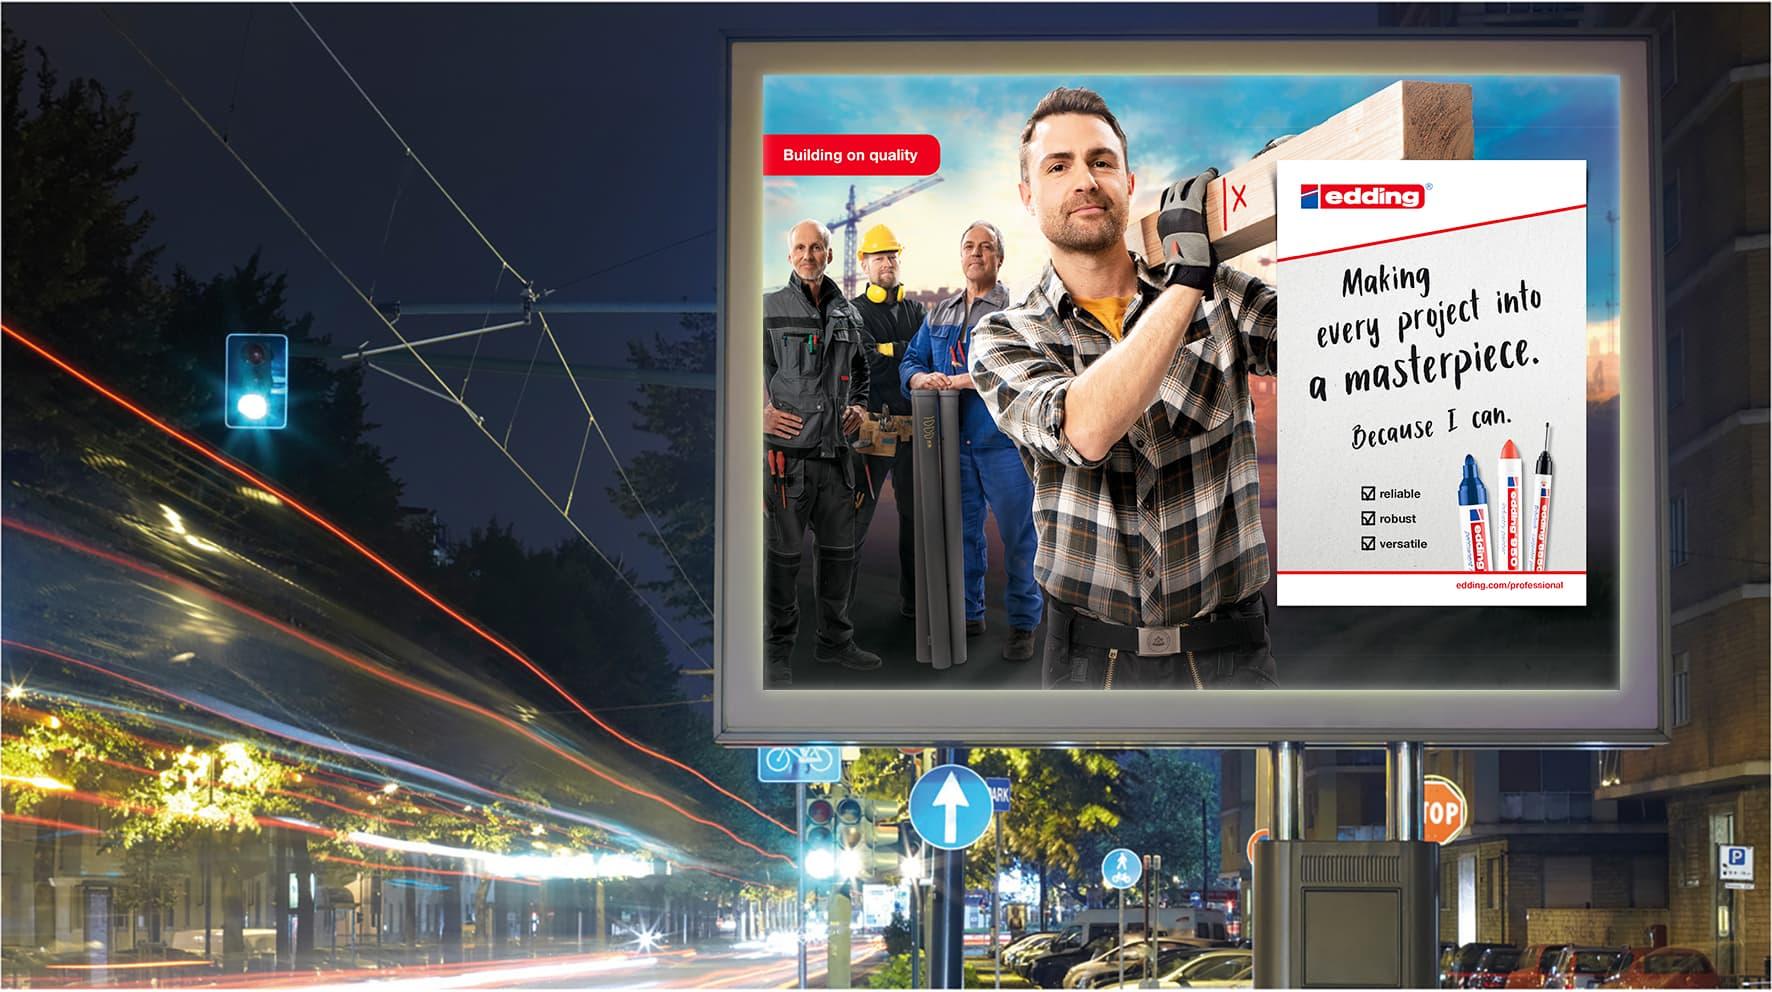 edding Craftsmen Kampagne Plakat Mock-Up Rückemänner Werbeagentur Hamburg